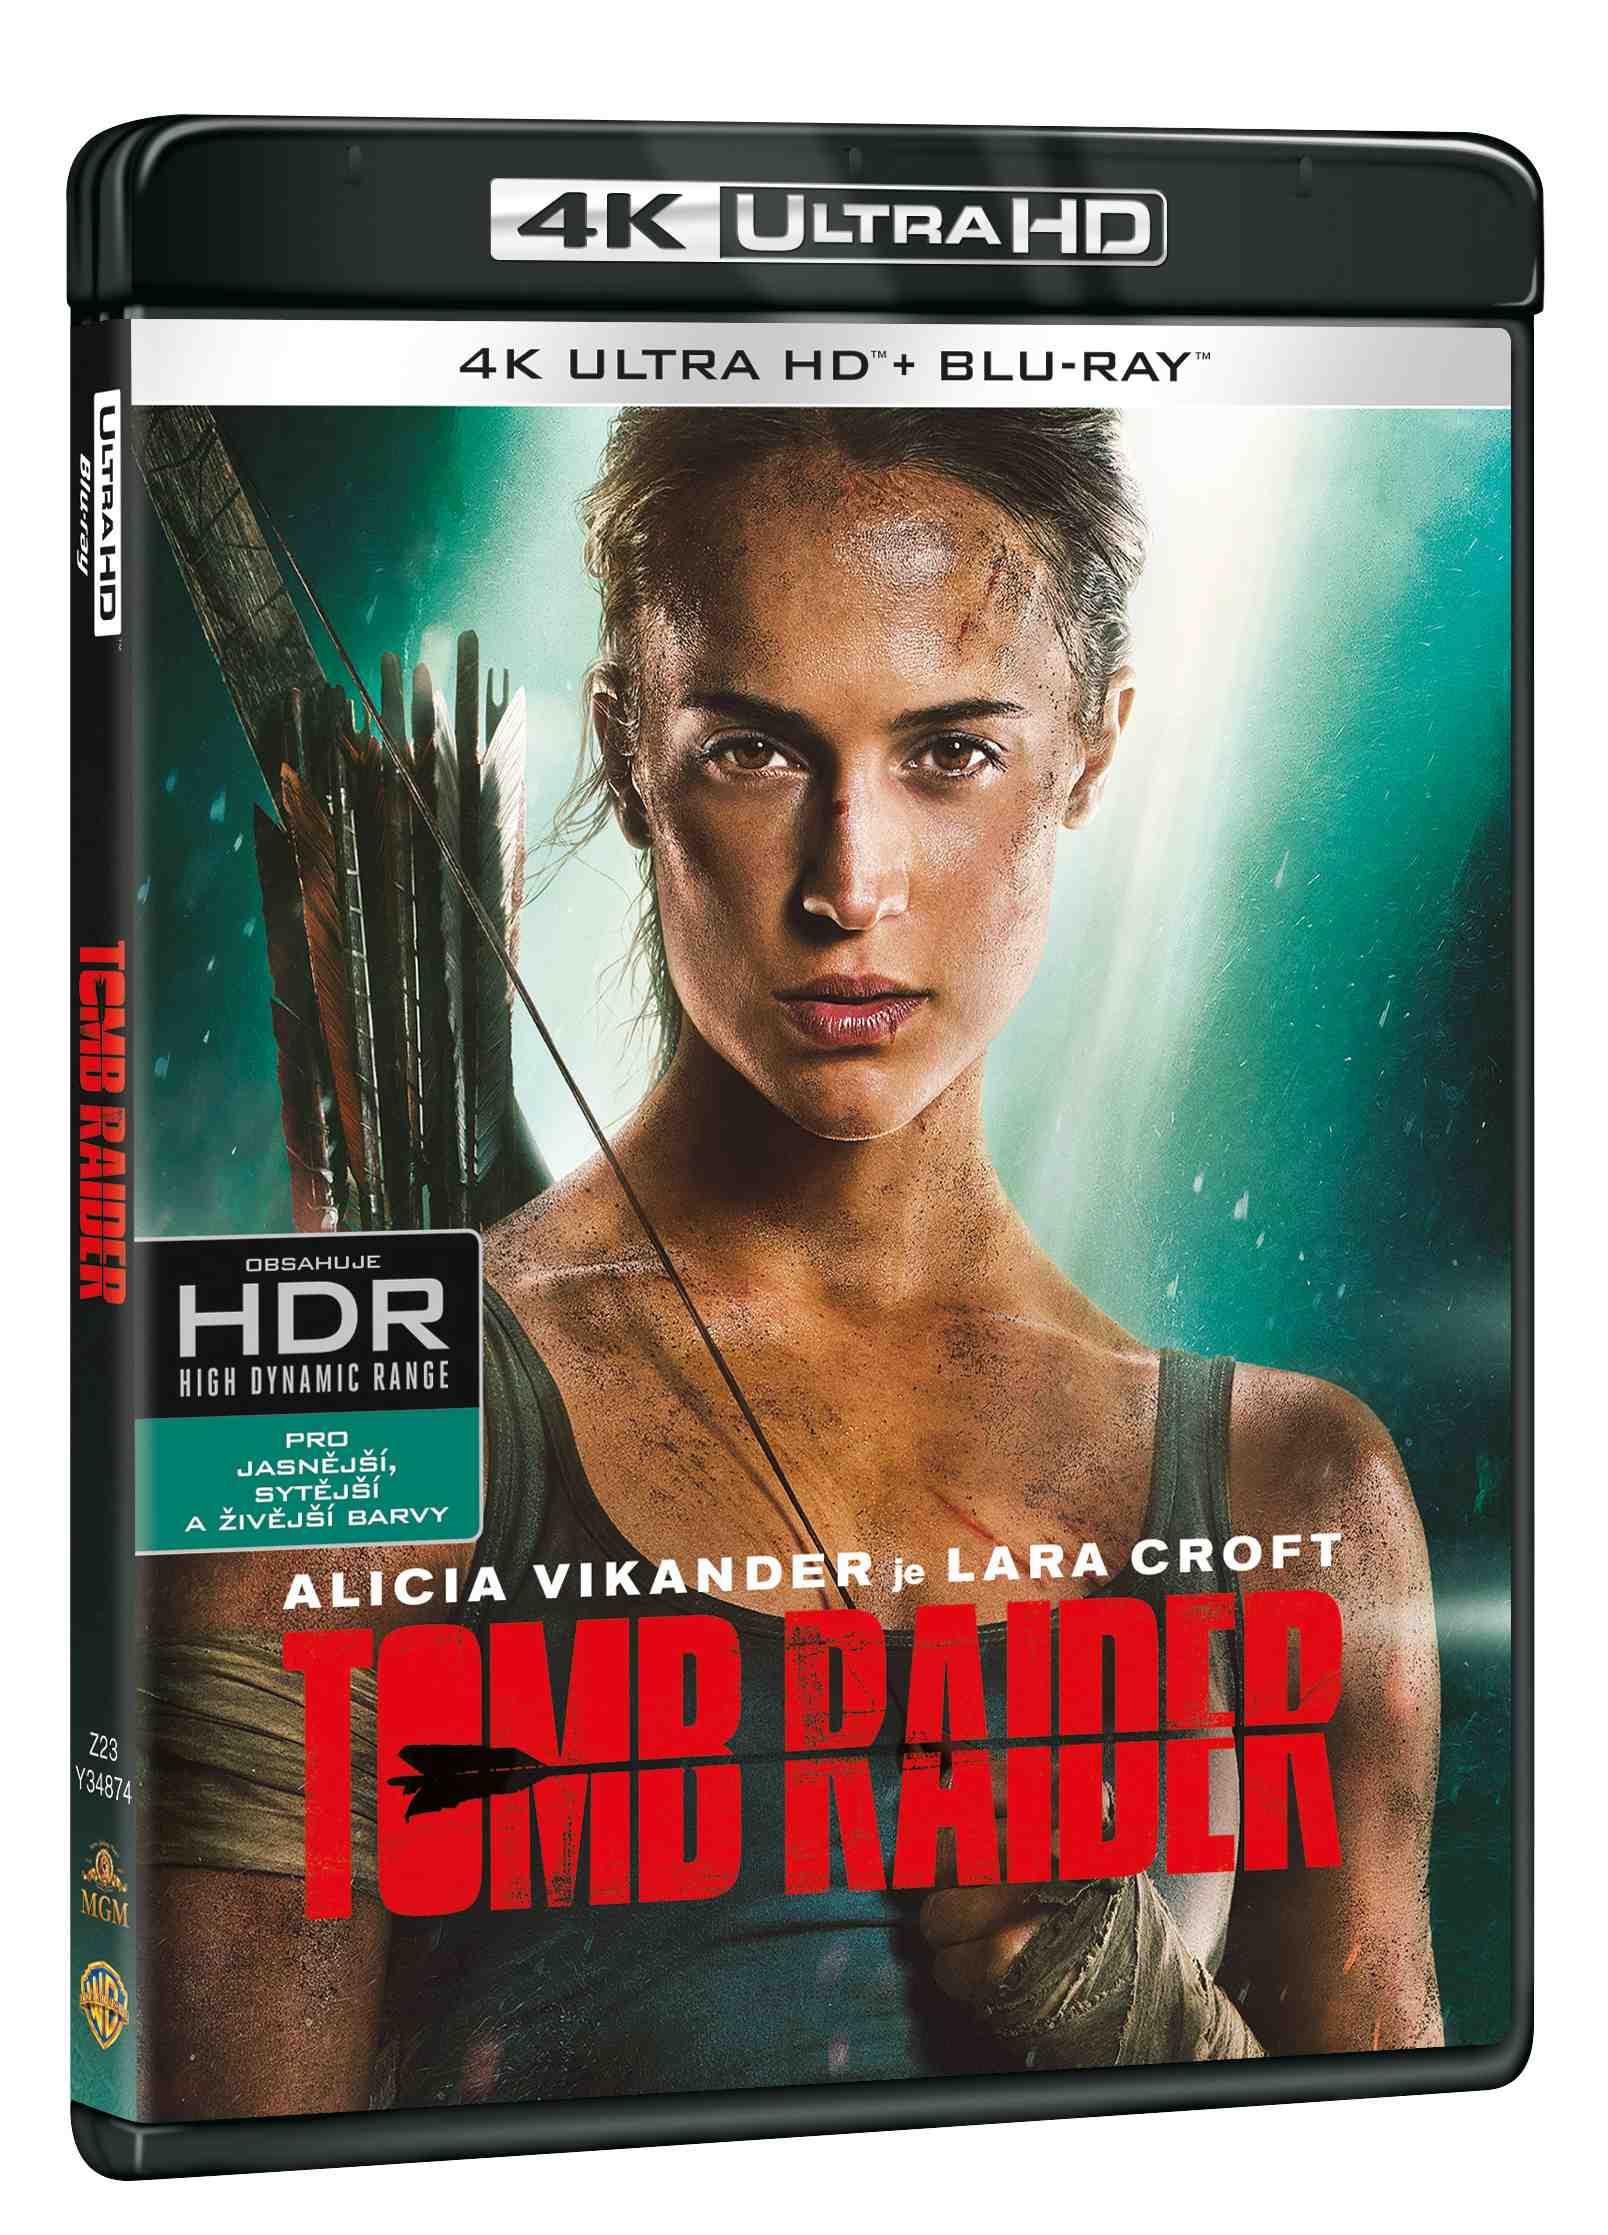 Tomb Raider (4K ULTRA HD) - UHD Blu-ray + Blu-ray (2 BD)